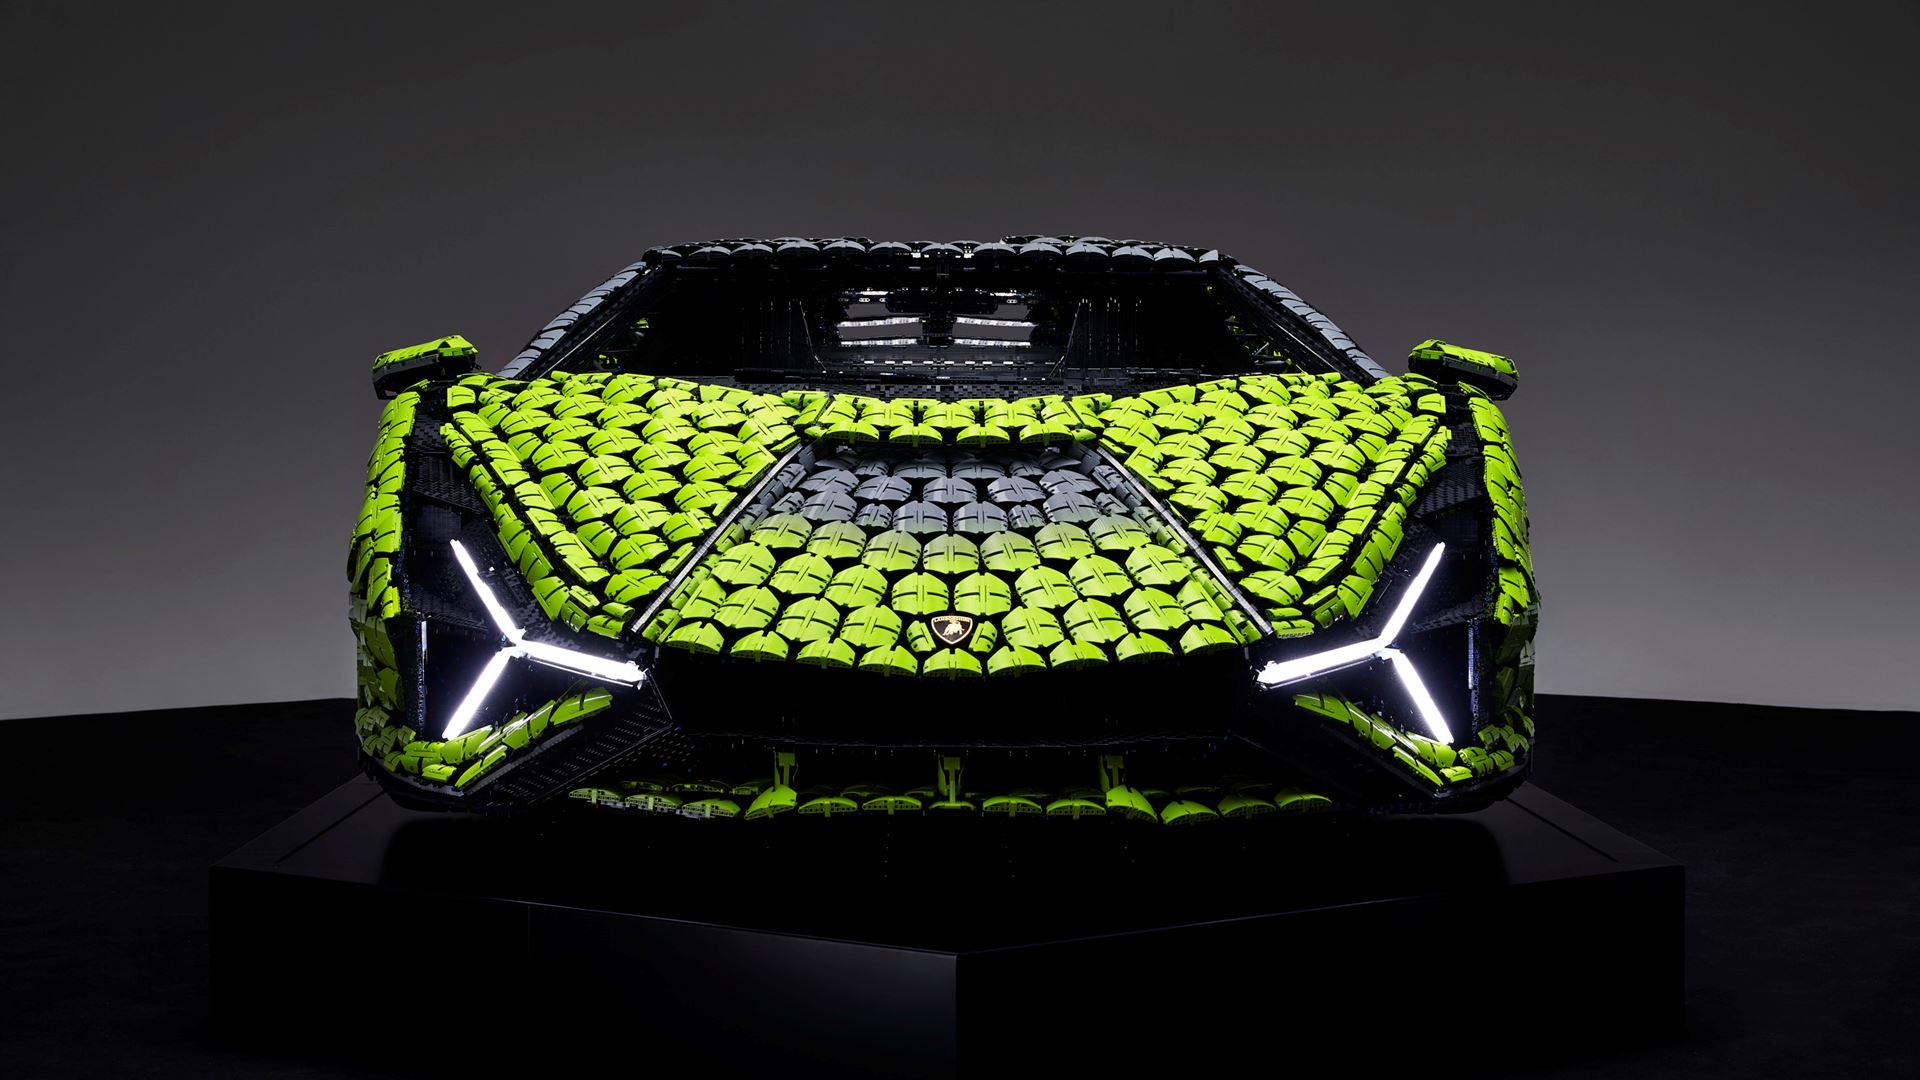 Automobili Lamborghini builds dream cars, also with LEGO® Technic™ - Life-size Lamborghini Sián FKP 37 created from over 400,000 LEGO® elements - Image 7